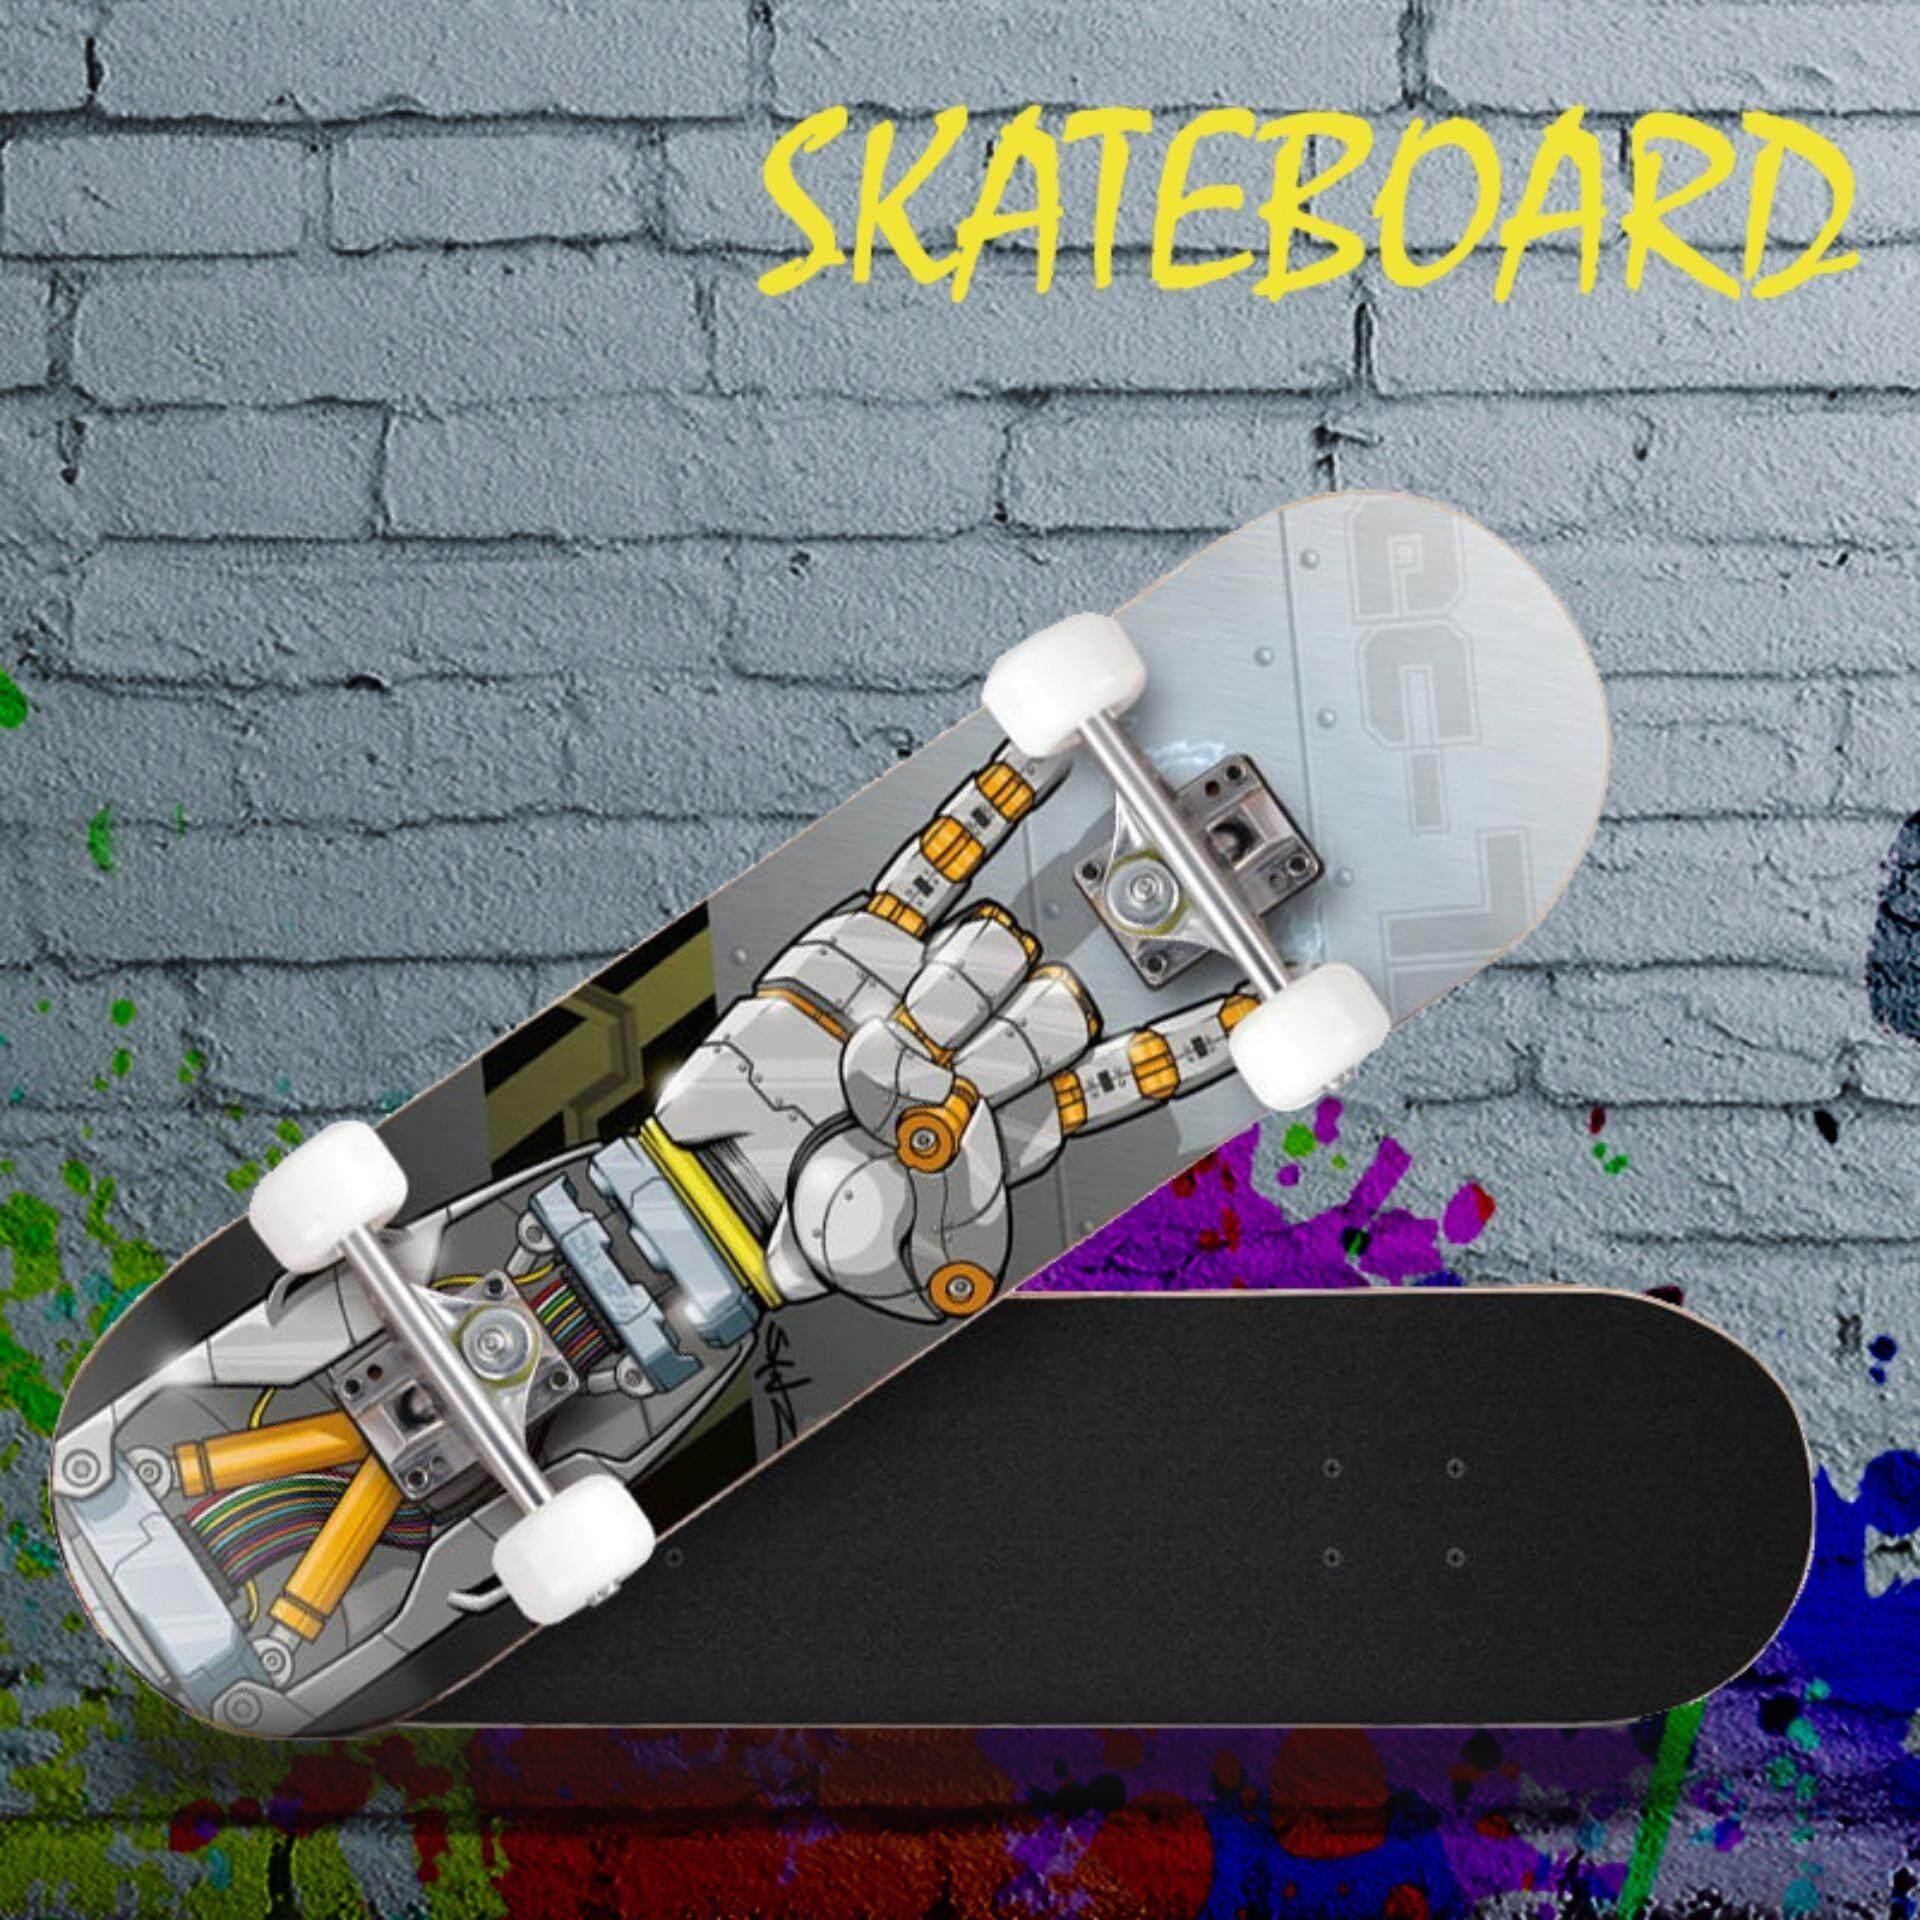 skateboard สเก็ตบอร์ด สเก็ตบอร์ดสไลด์ สี่ล้อเด็กผู้ใหญ่กระดานยาว สันทนาการกลางแจ้ง Unisex -skateboard สเก็ตบอร์ดสำหรับผู้เริ่มเล่น /มืออาชีพ